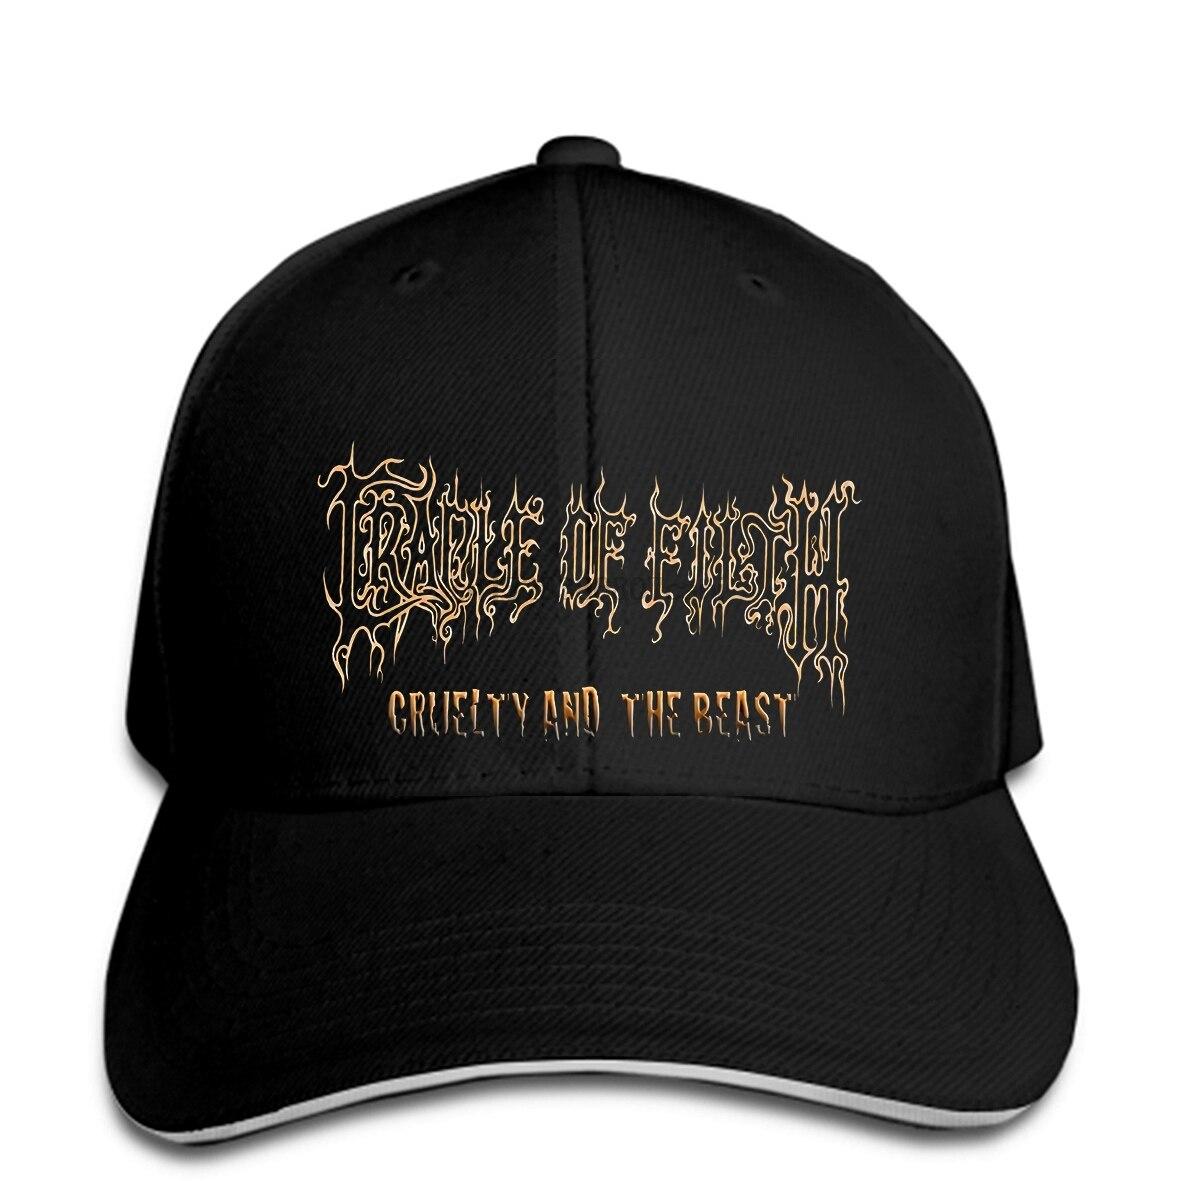 Liefern Baseball Kappe Cradle Of Filth-cruelty Und Das Biest-neue Baseball Caps-dtg Gedruckt-s